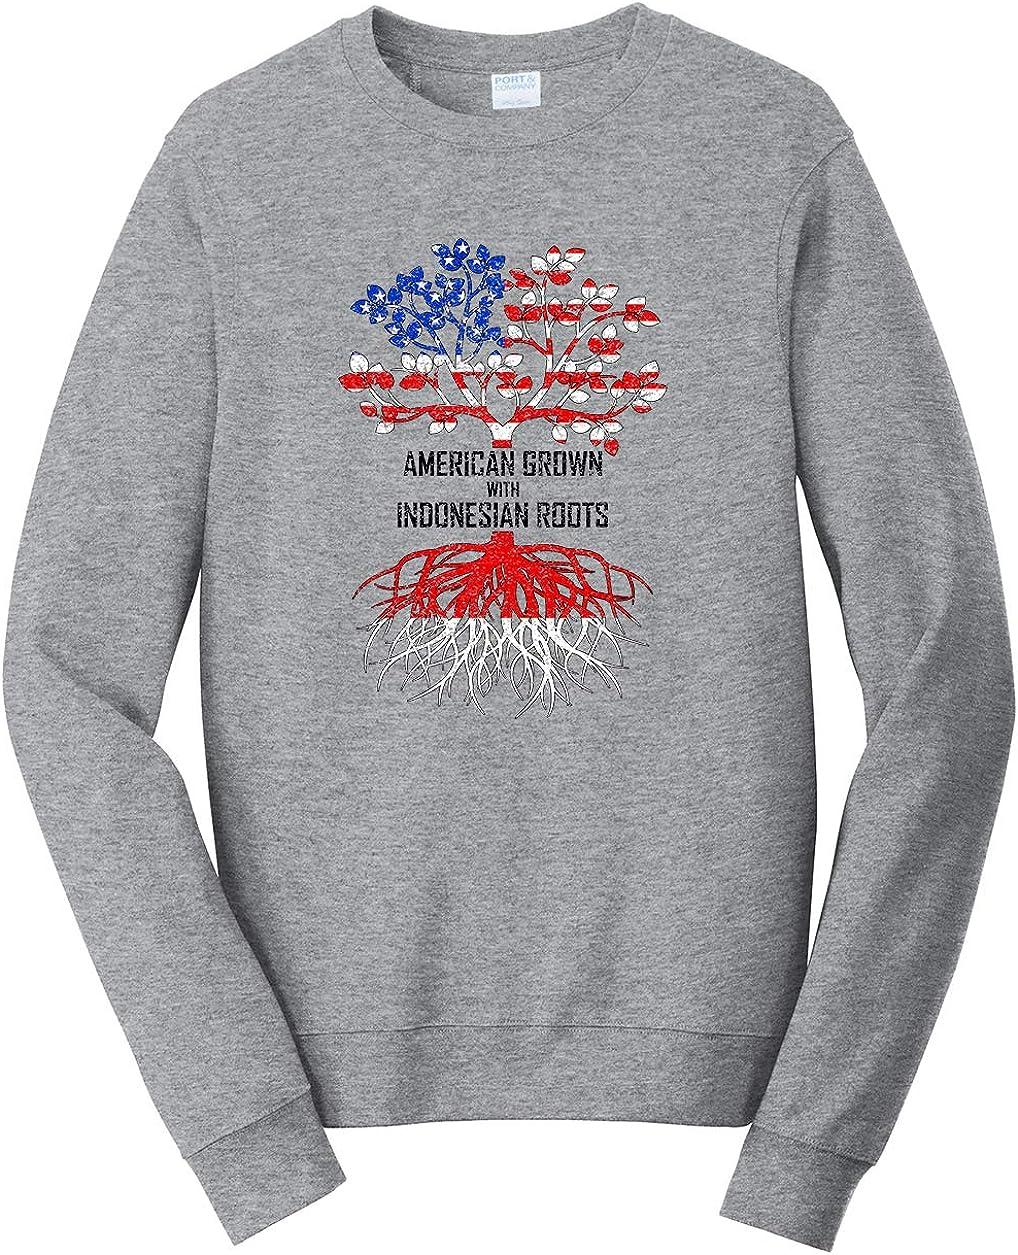 Tenacitee Unisex American Grown with Indonesian Roots Sweatshirt